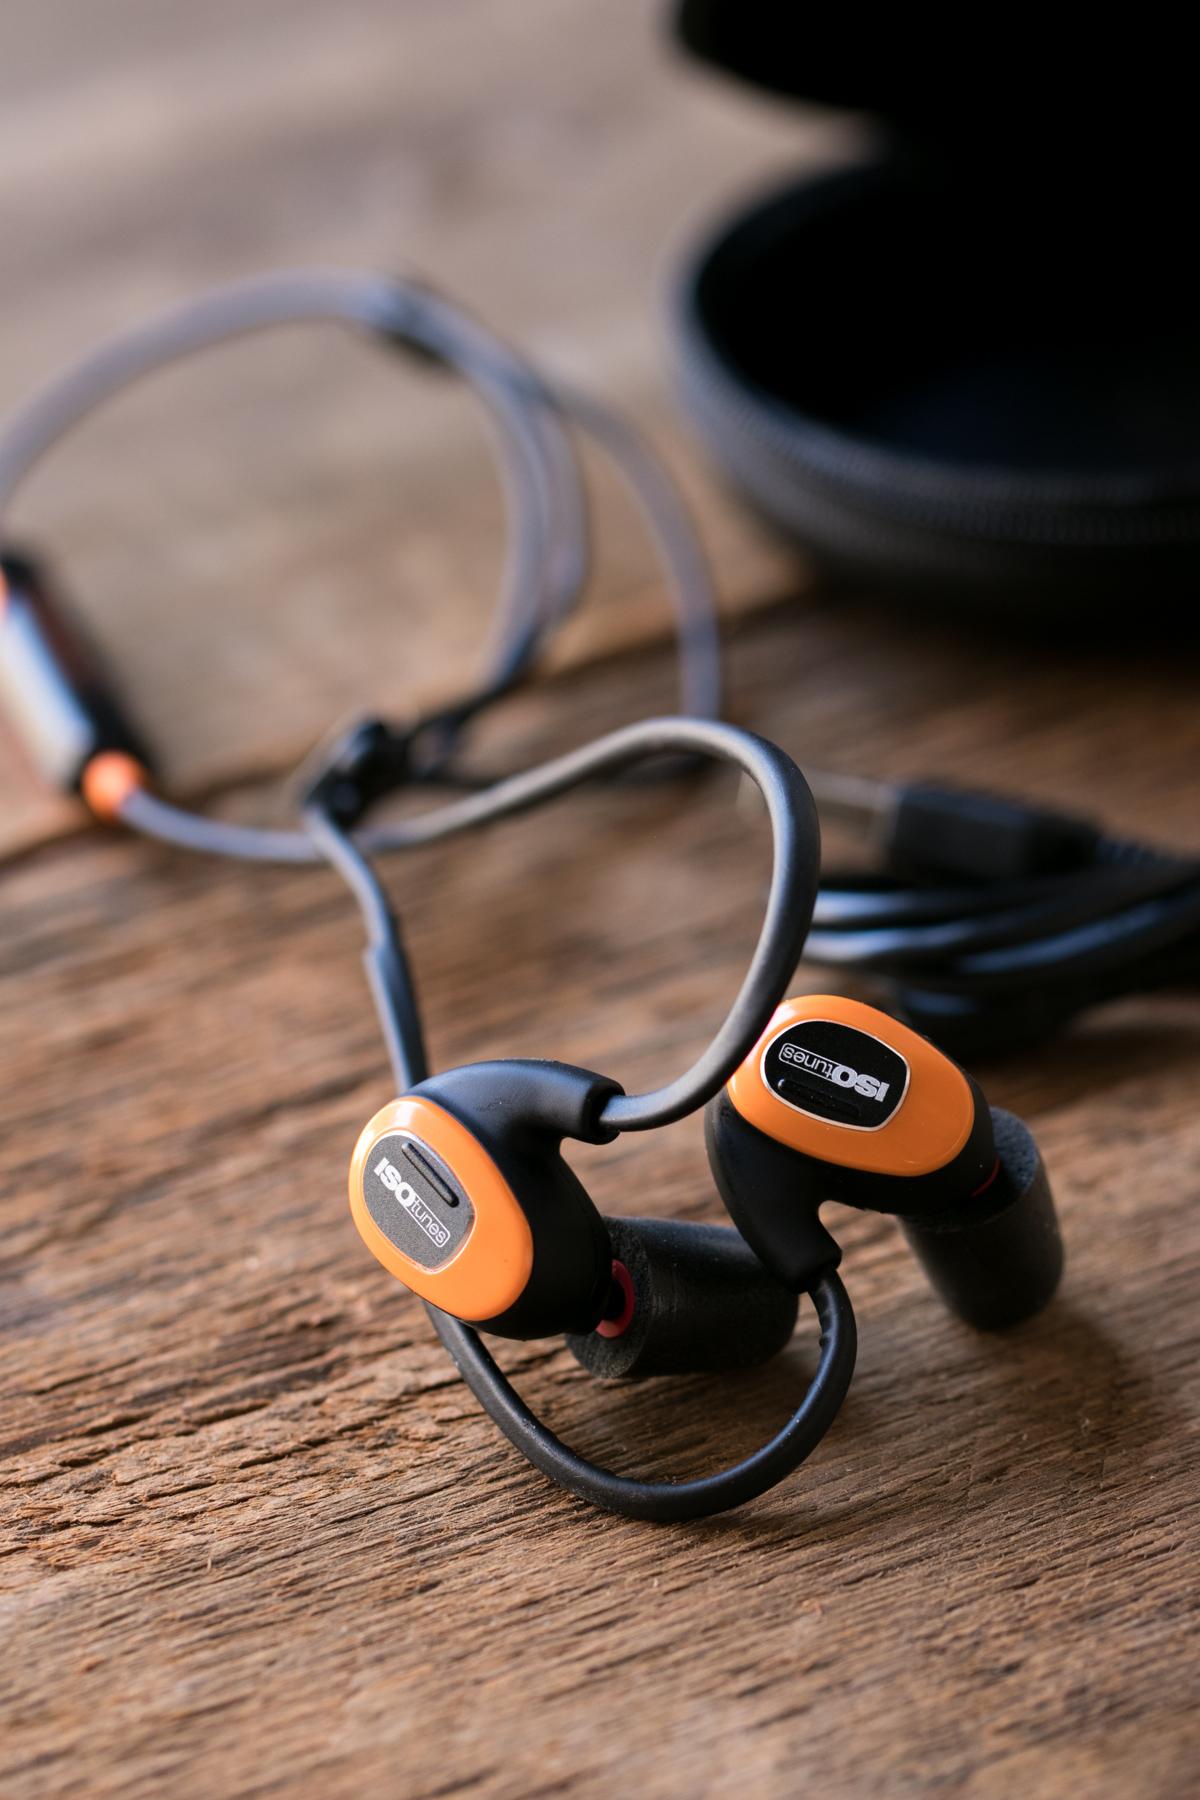 IsoTunes noise cancelling headphones